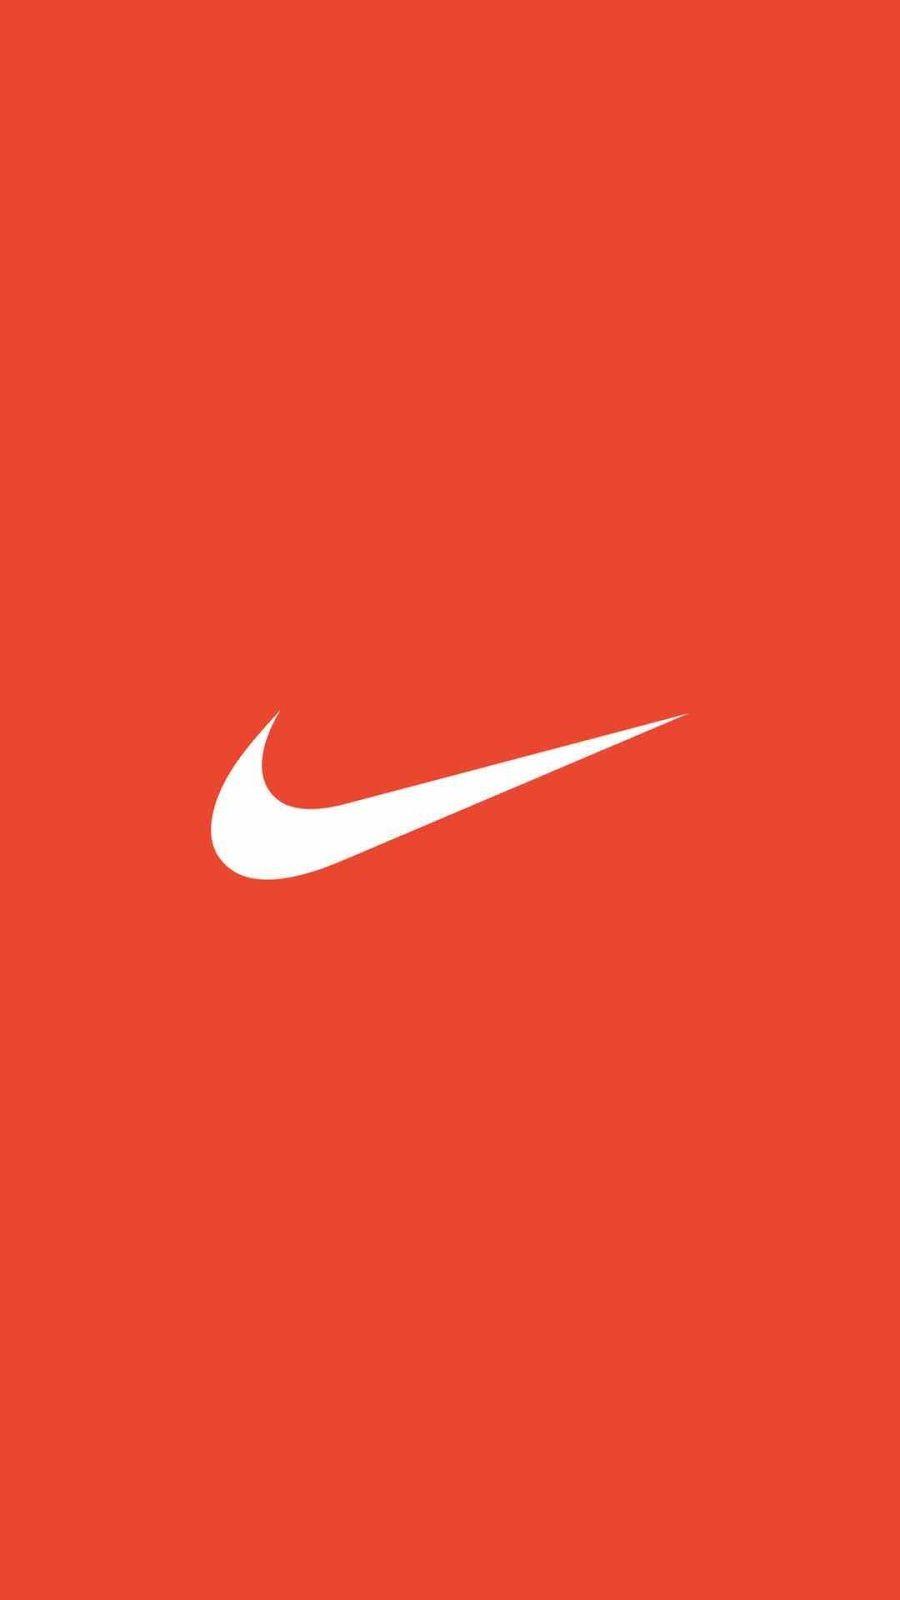 Nike Iphone Wallpapers Hd Nike Wallpaper Nike Logo Wallpapers Nike Red Wallpaper